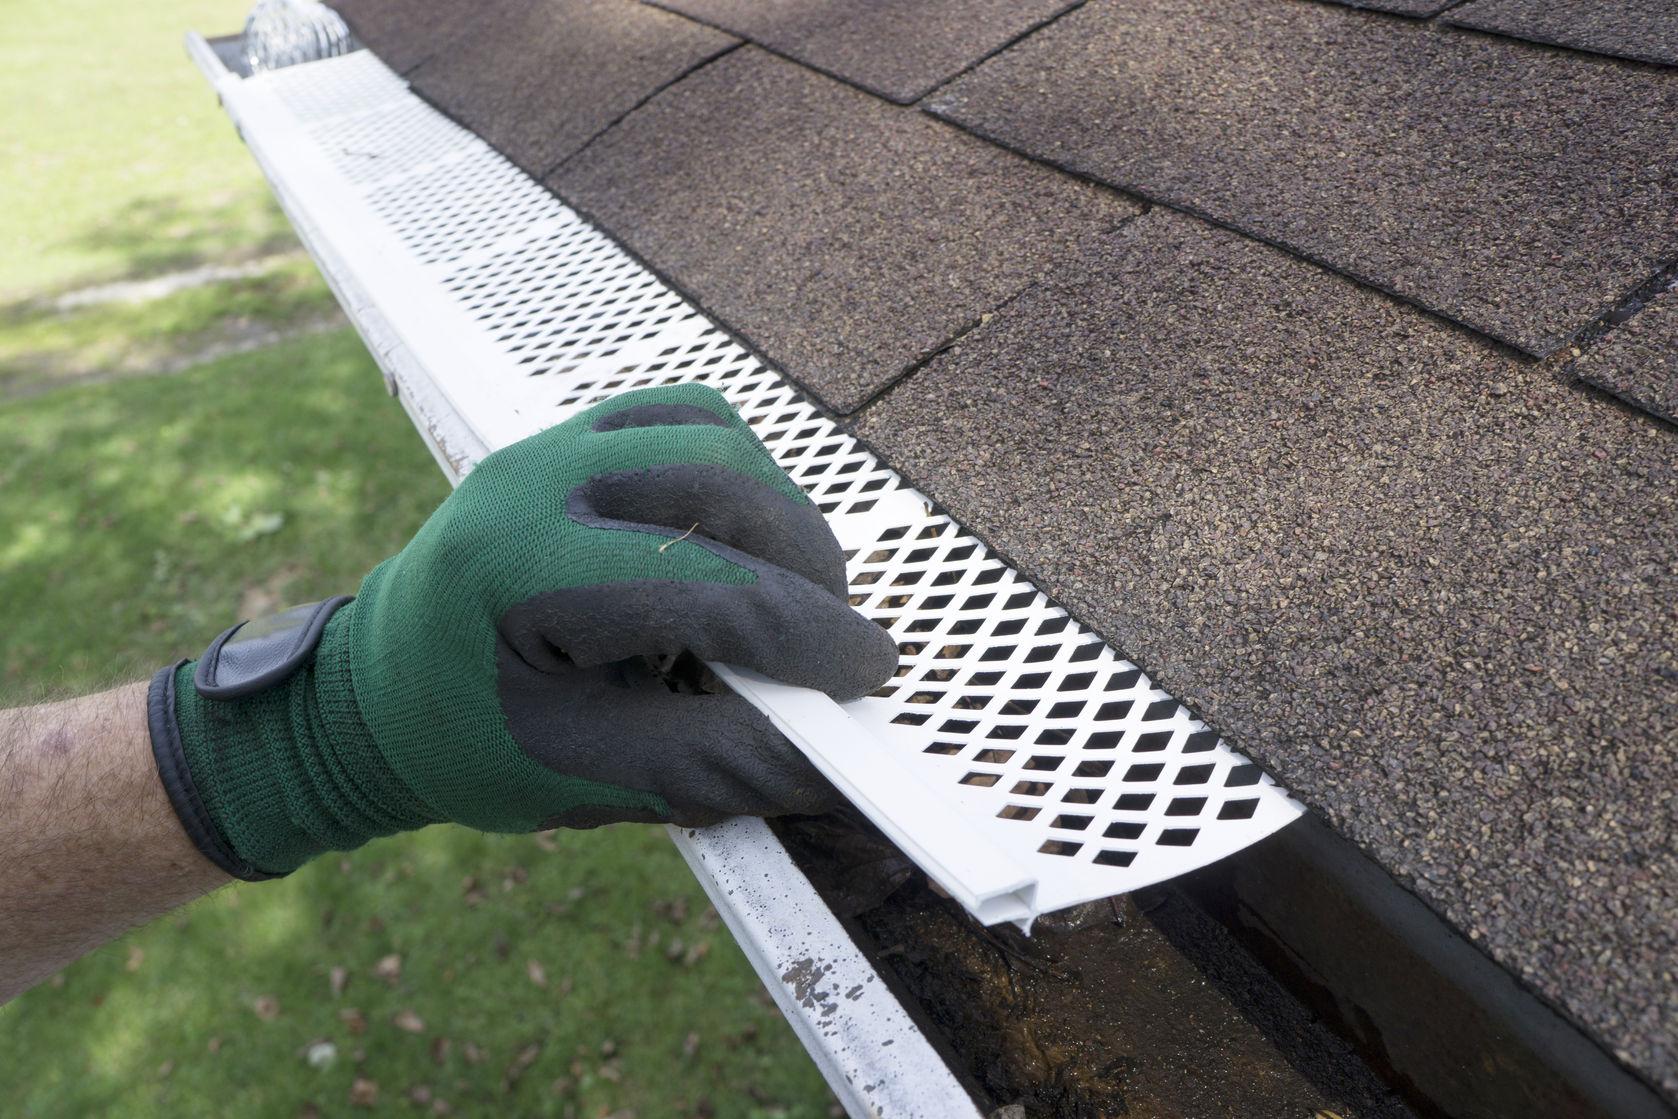 roofing contractors gutter guard